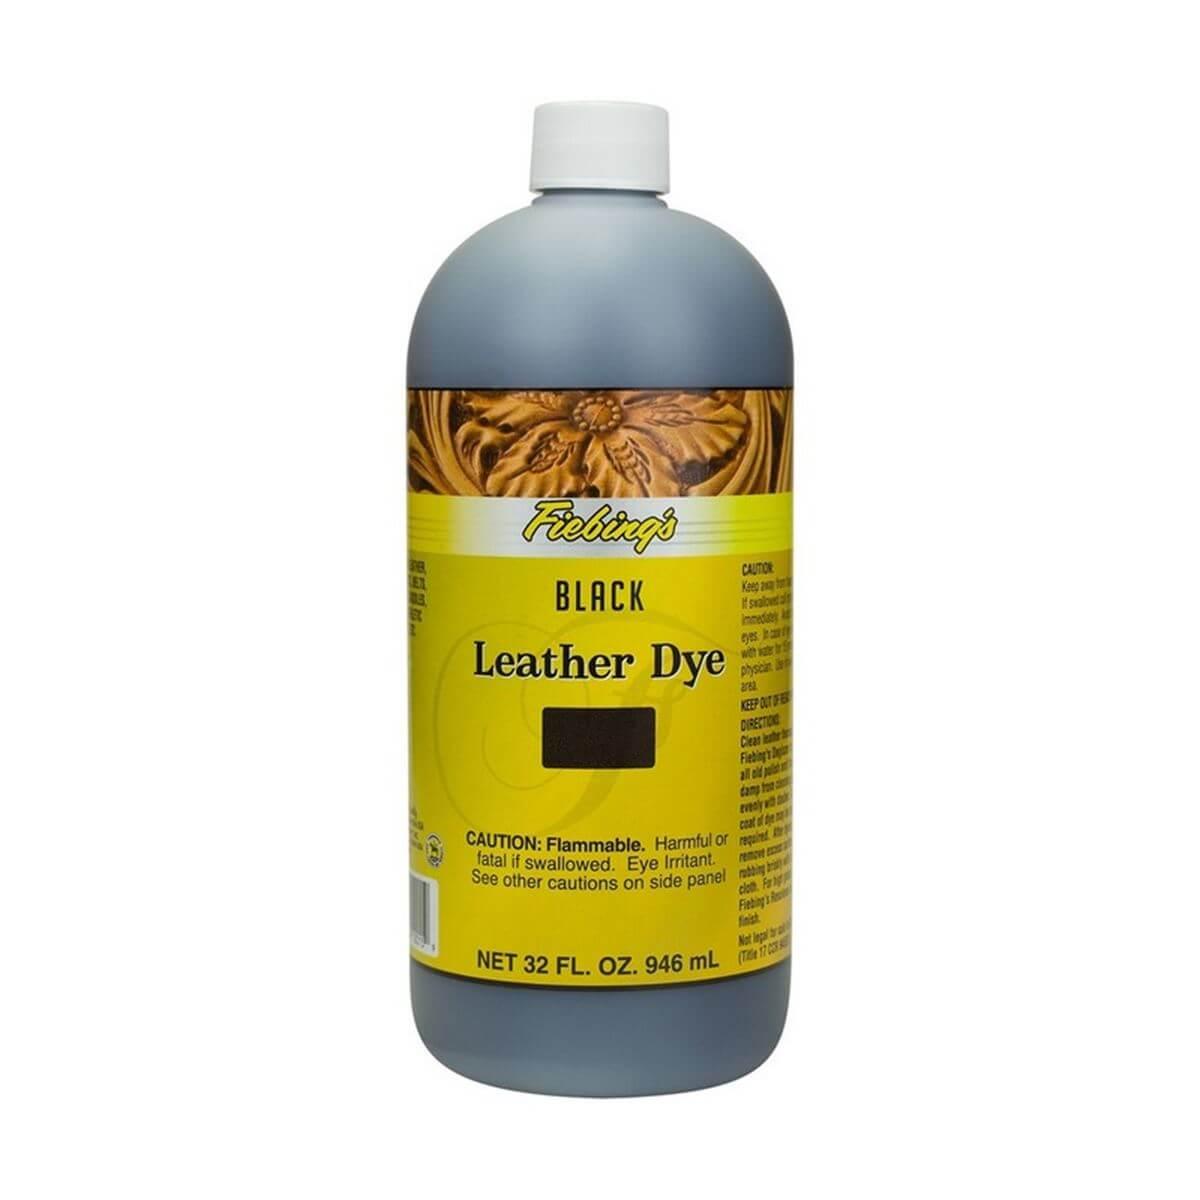 Teinture pour cuir - Fiebing's Leather dye - 946ml